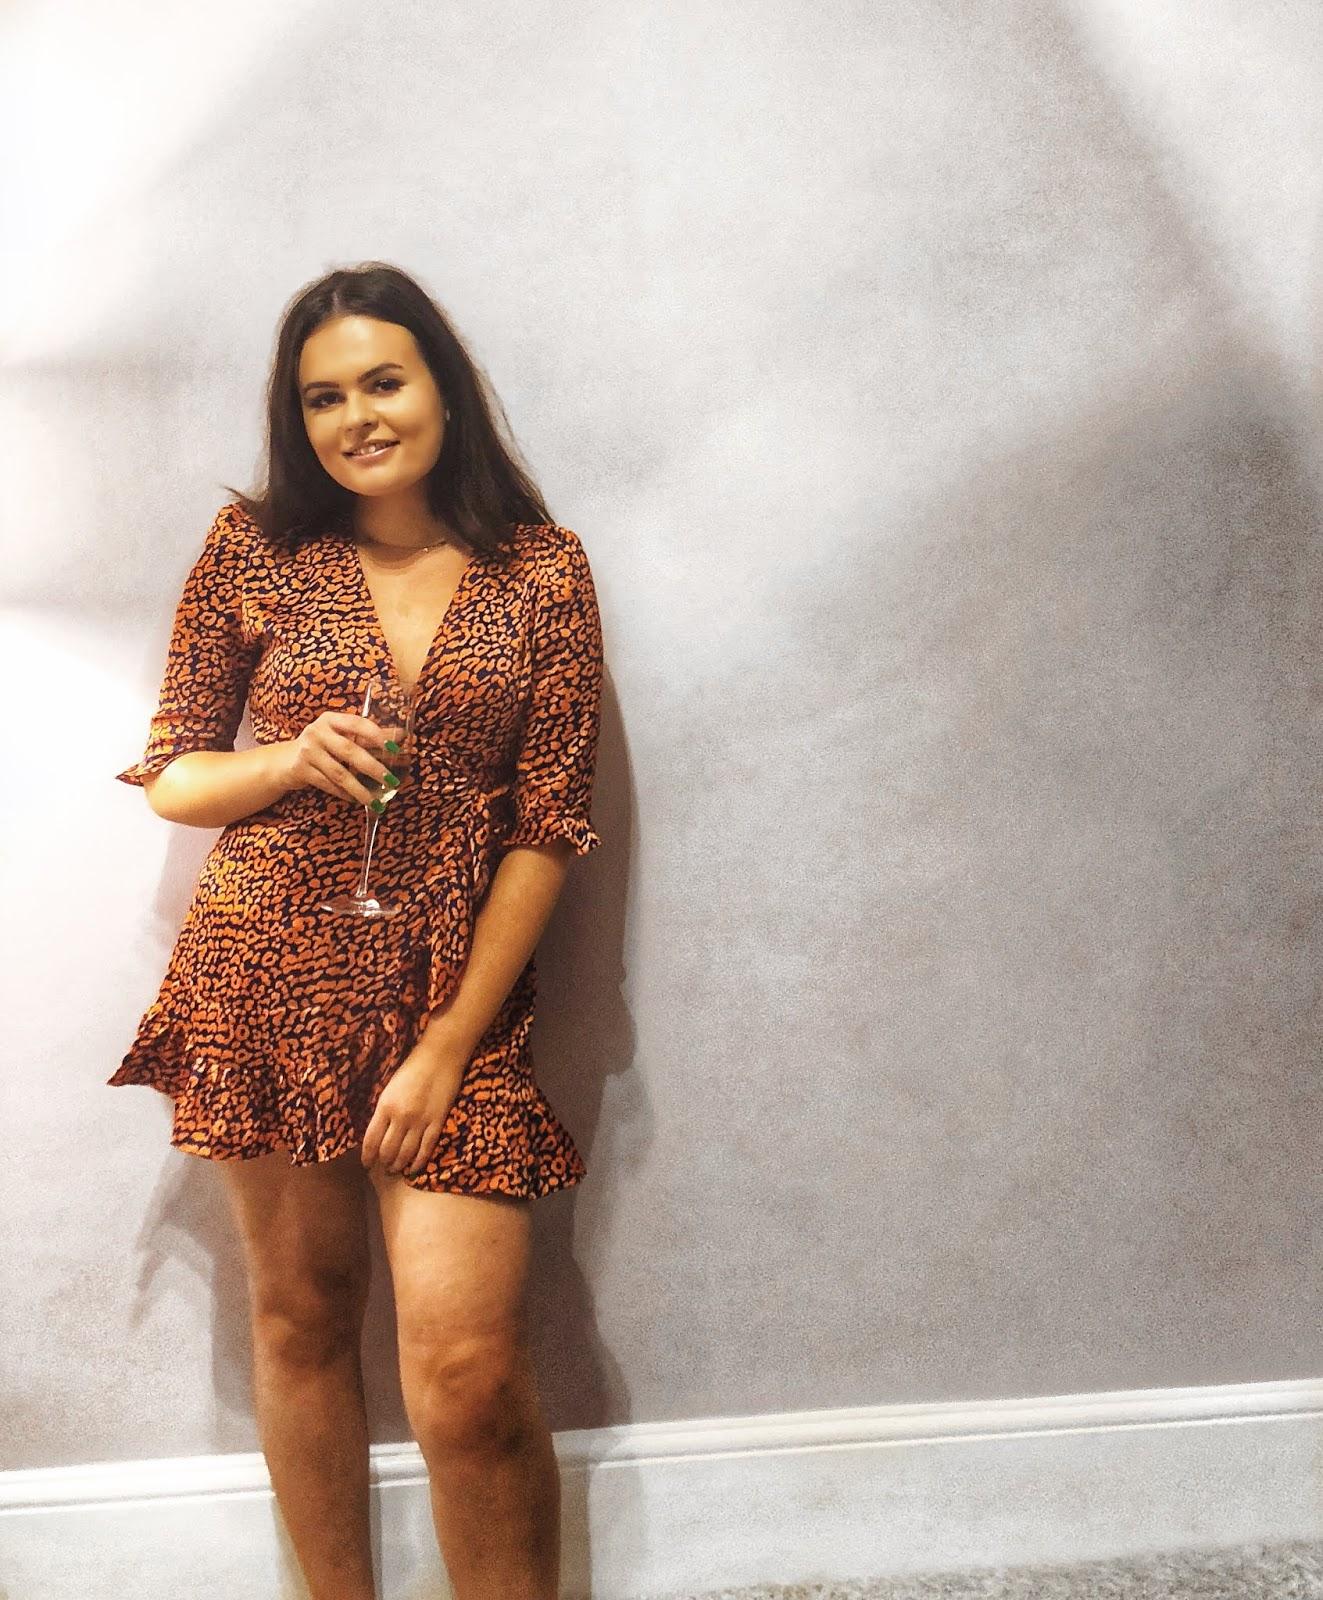 boohoo Satin Leopard Print Ruffle Wrap Tea Dress, cheap never fully dressed, never fully dressed discount code, megans balham, instagram places in london, cheap bottomless brunch in london, under £20 bottomless brunch